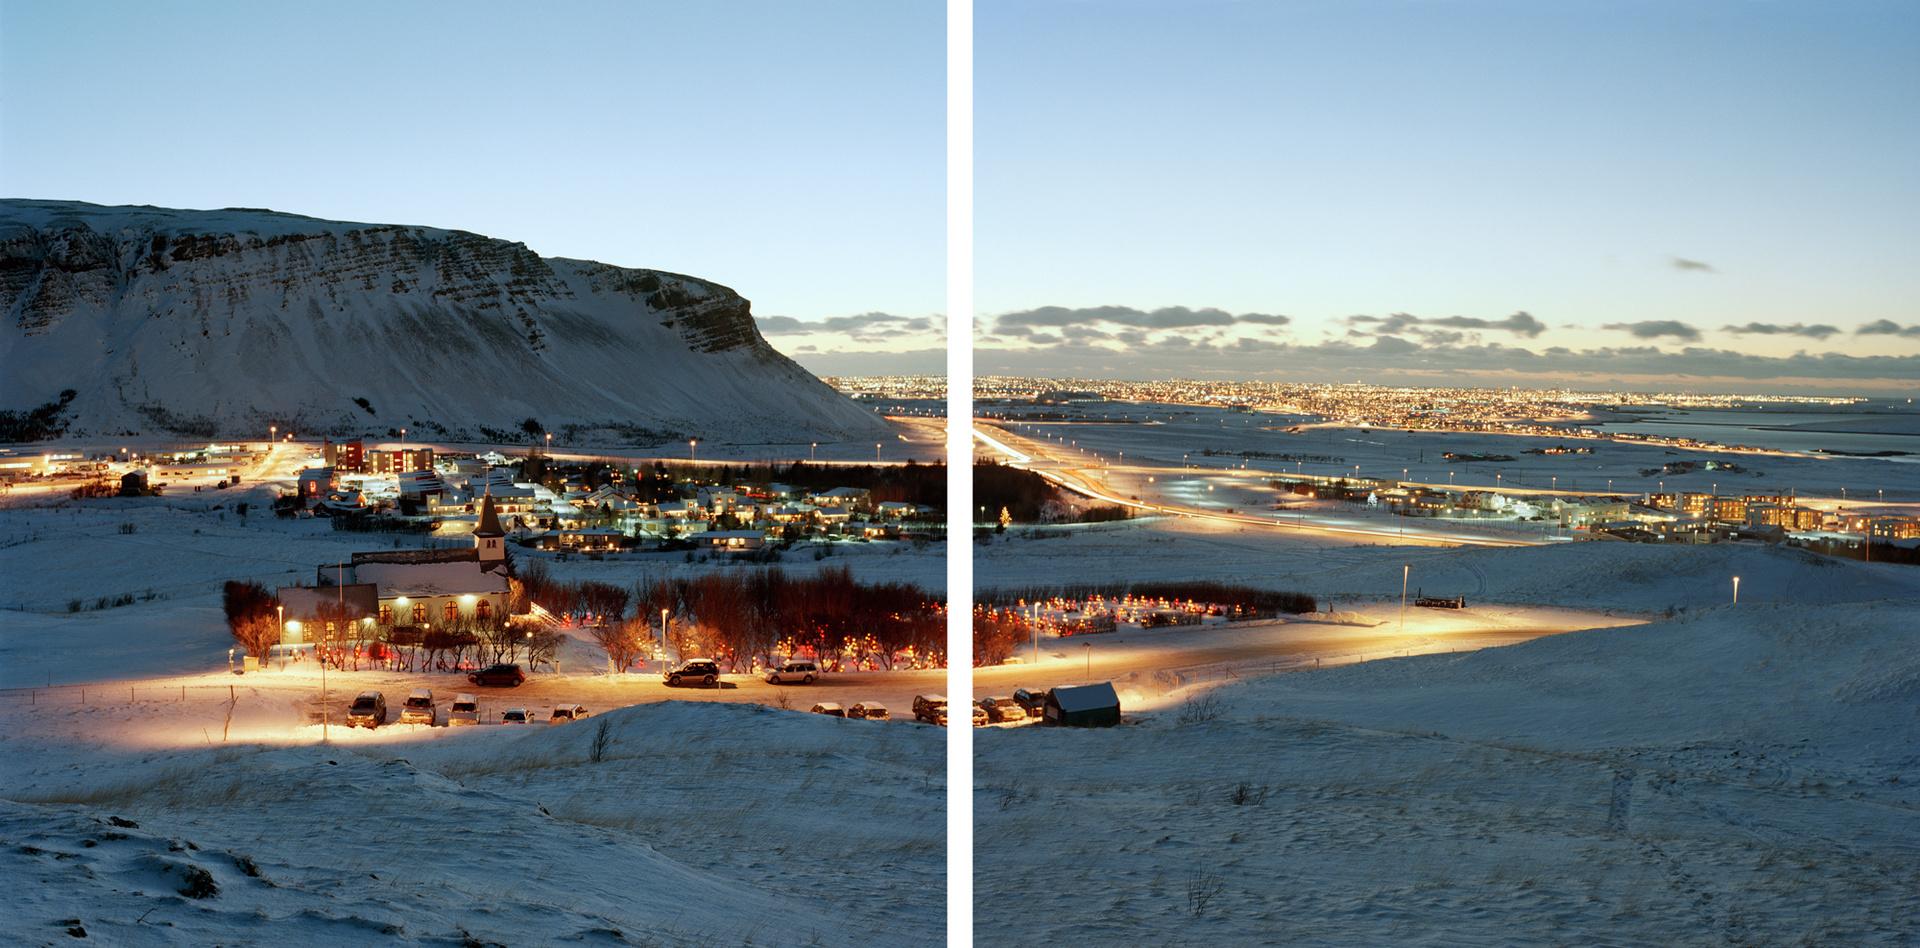 Iceland - Reykjavik, Lagafellskirkja